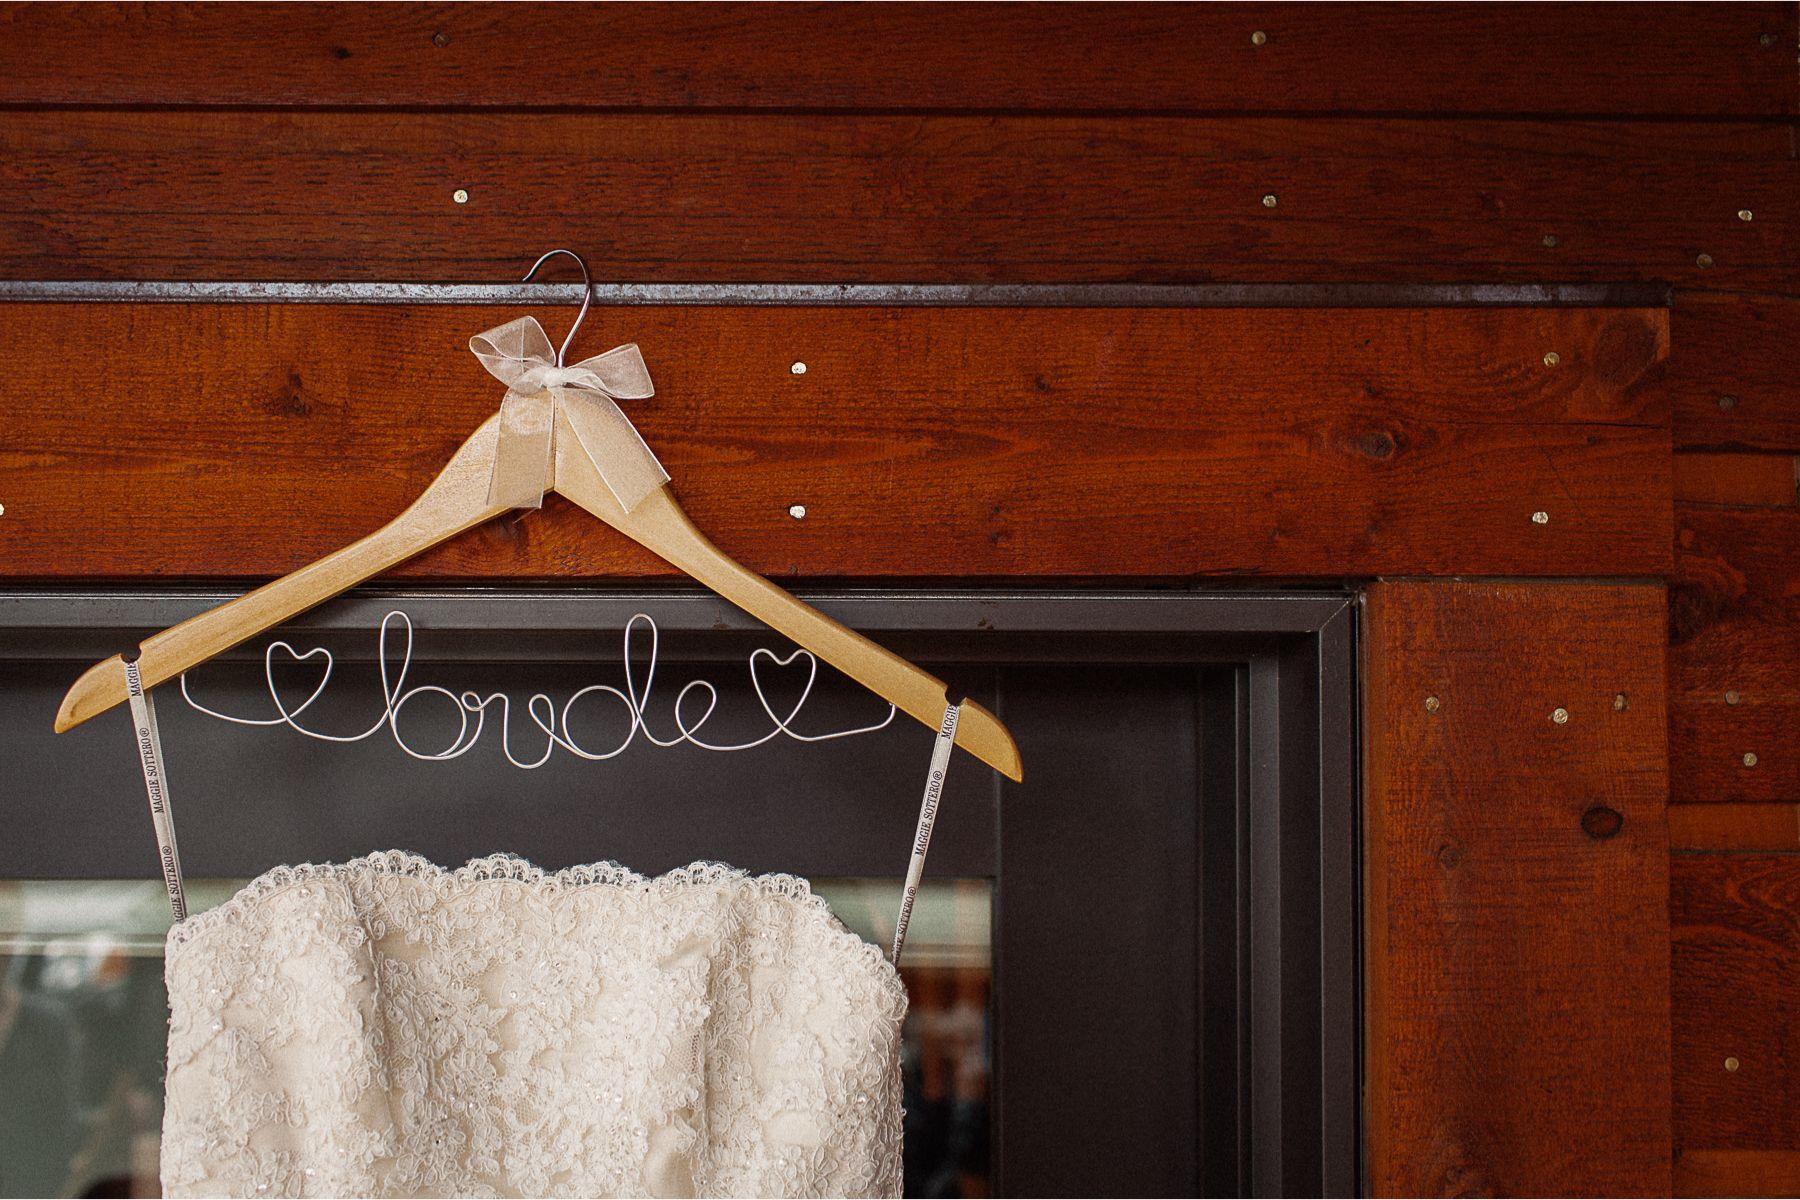 Custom Wedding Dress Hanger // Wedding Photography in Estes Park, Colorado // www.nicksparksweddings.com // Nick Sparks Wedding Photographer